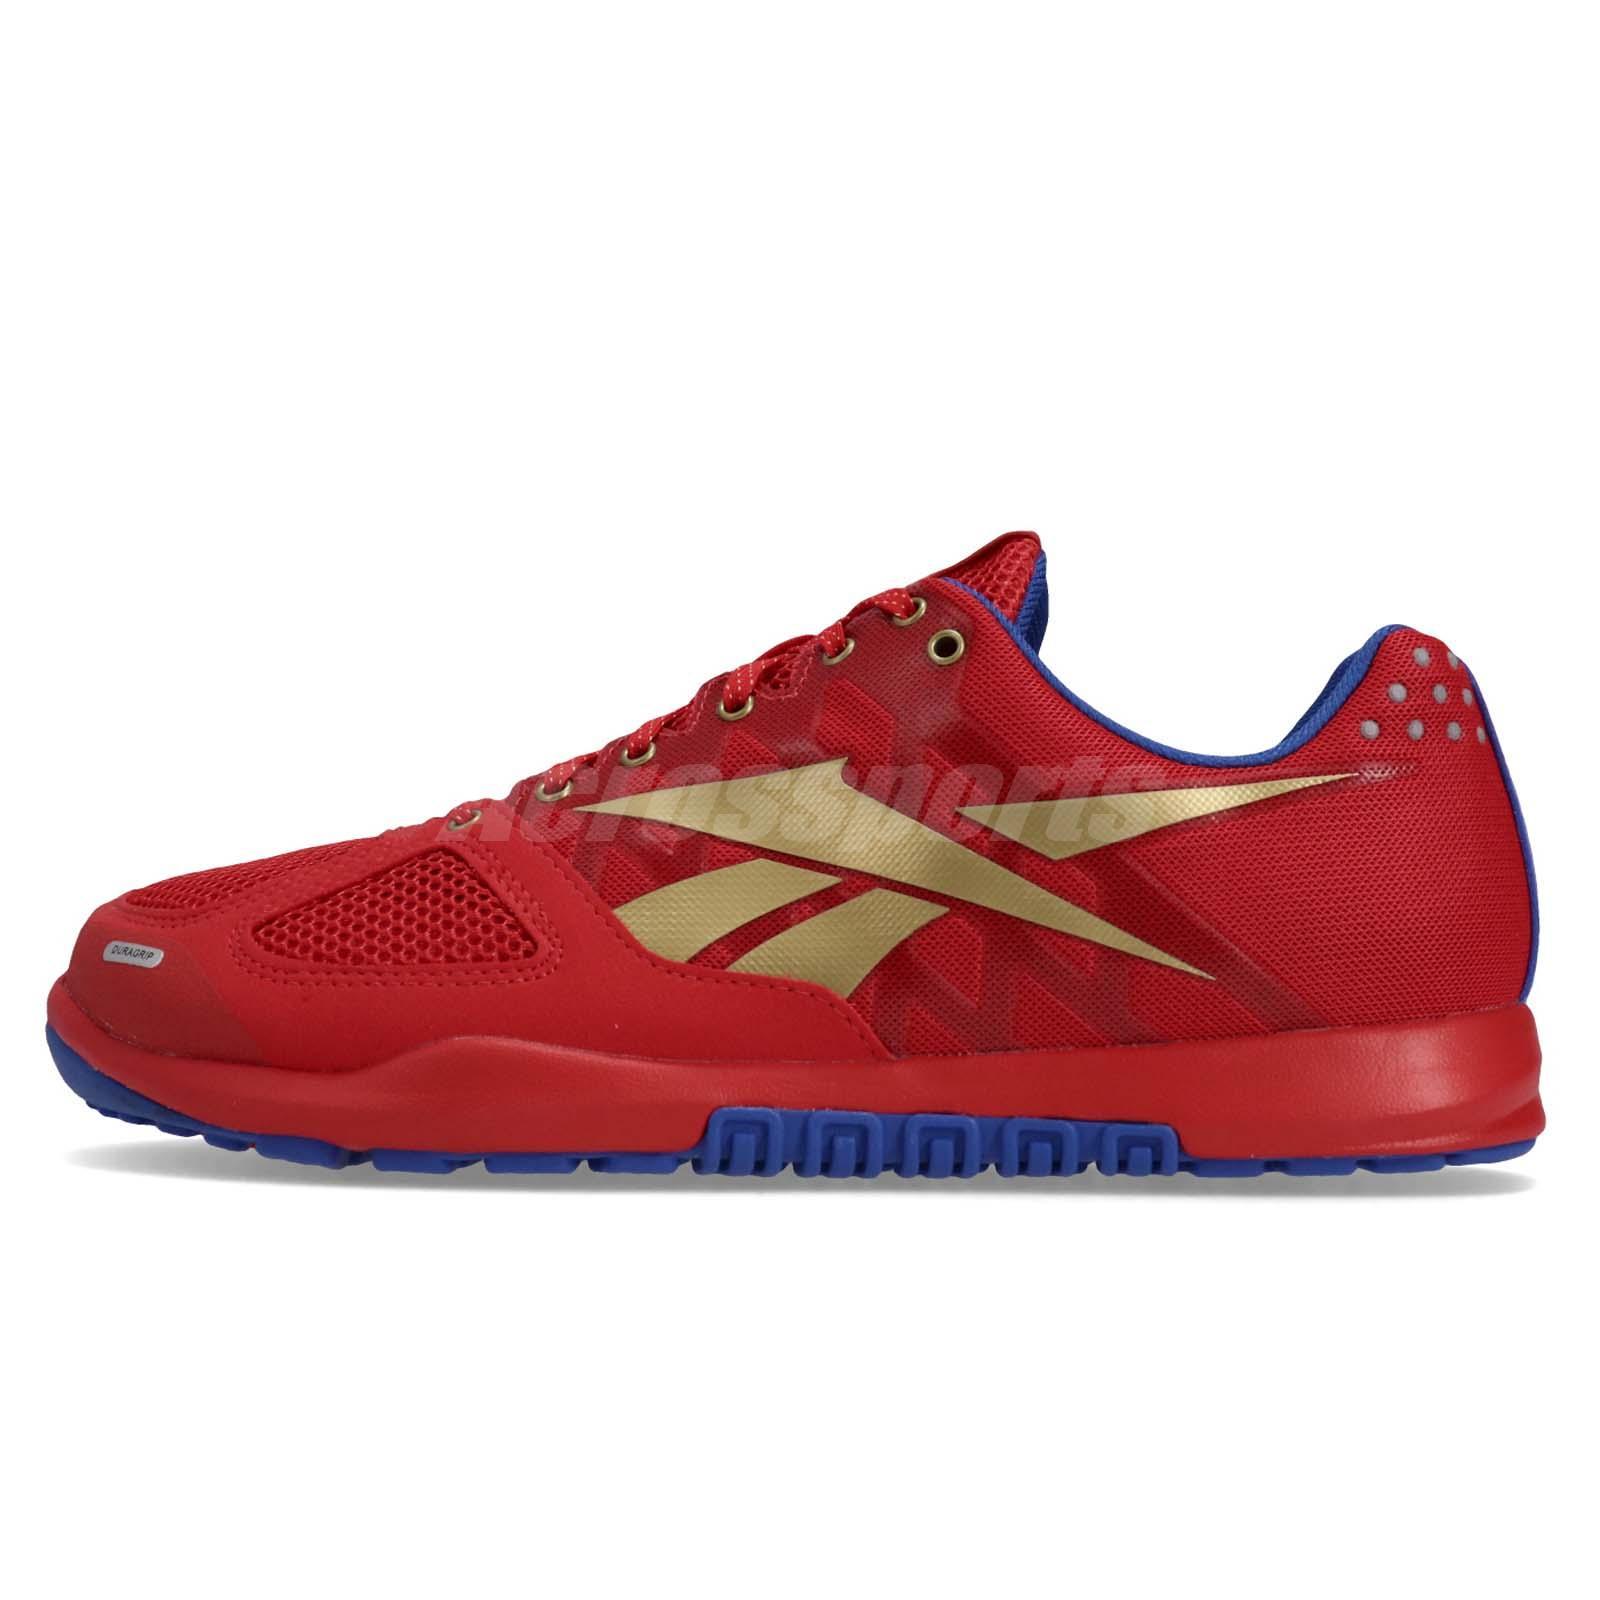 ab1650379eb Reebok R CrossFit Nano 2.0 Red Blue Gold Men Cross Training Shoes Sneaker  DV5758